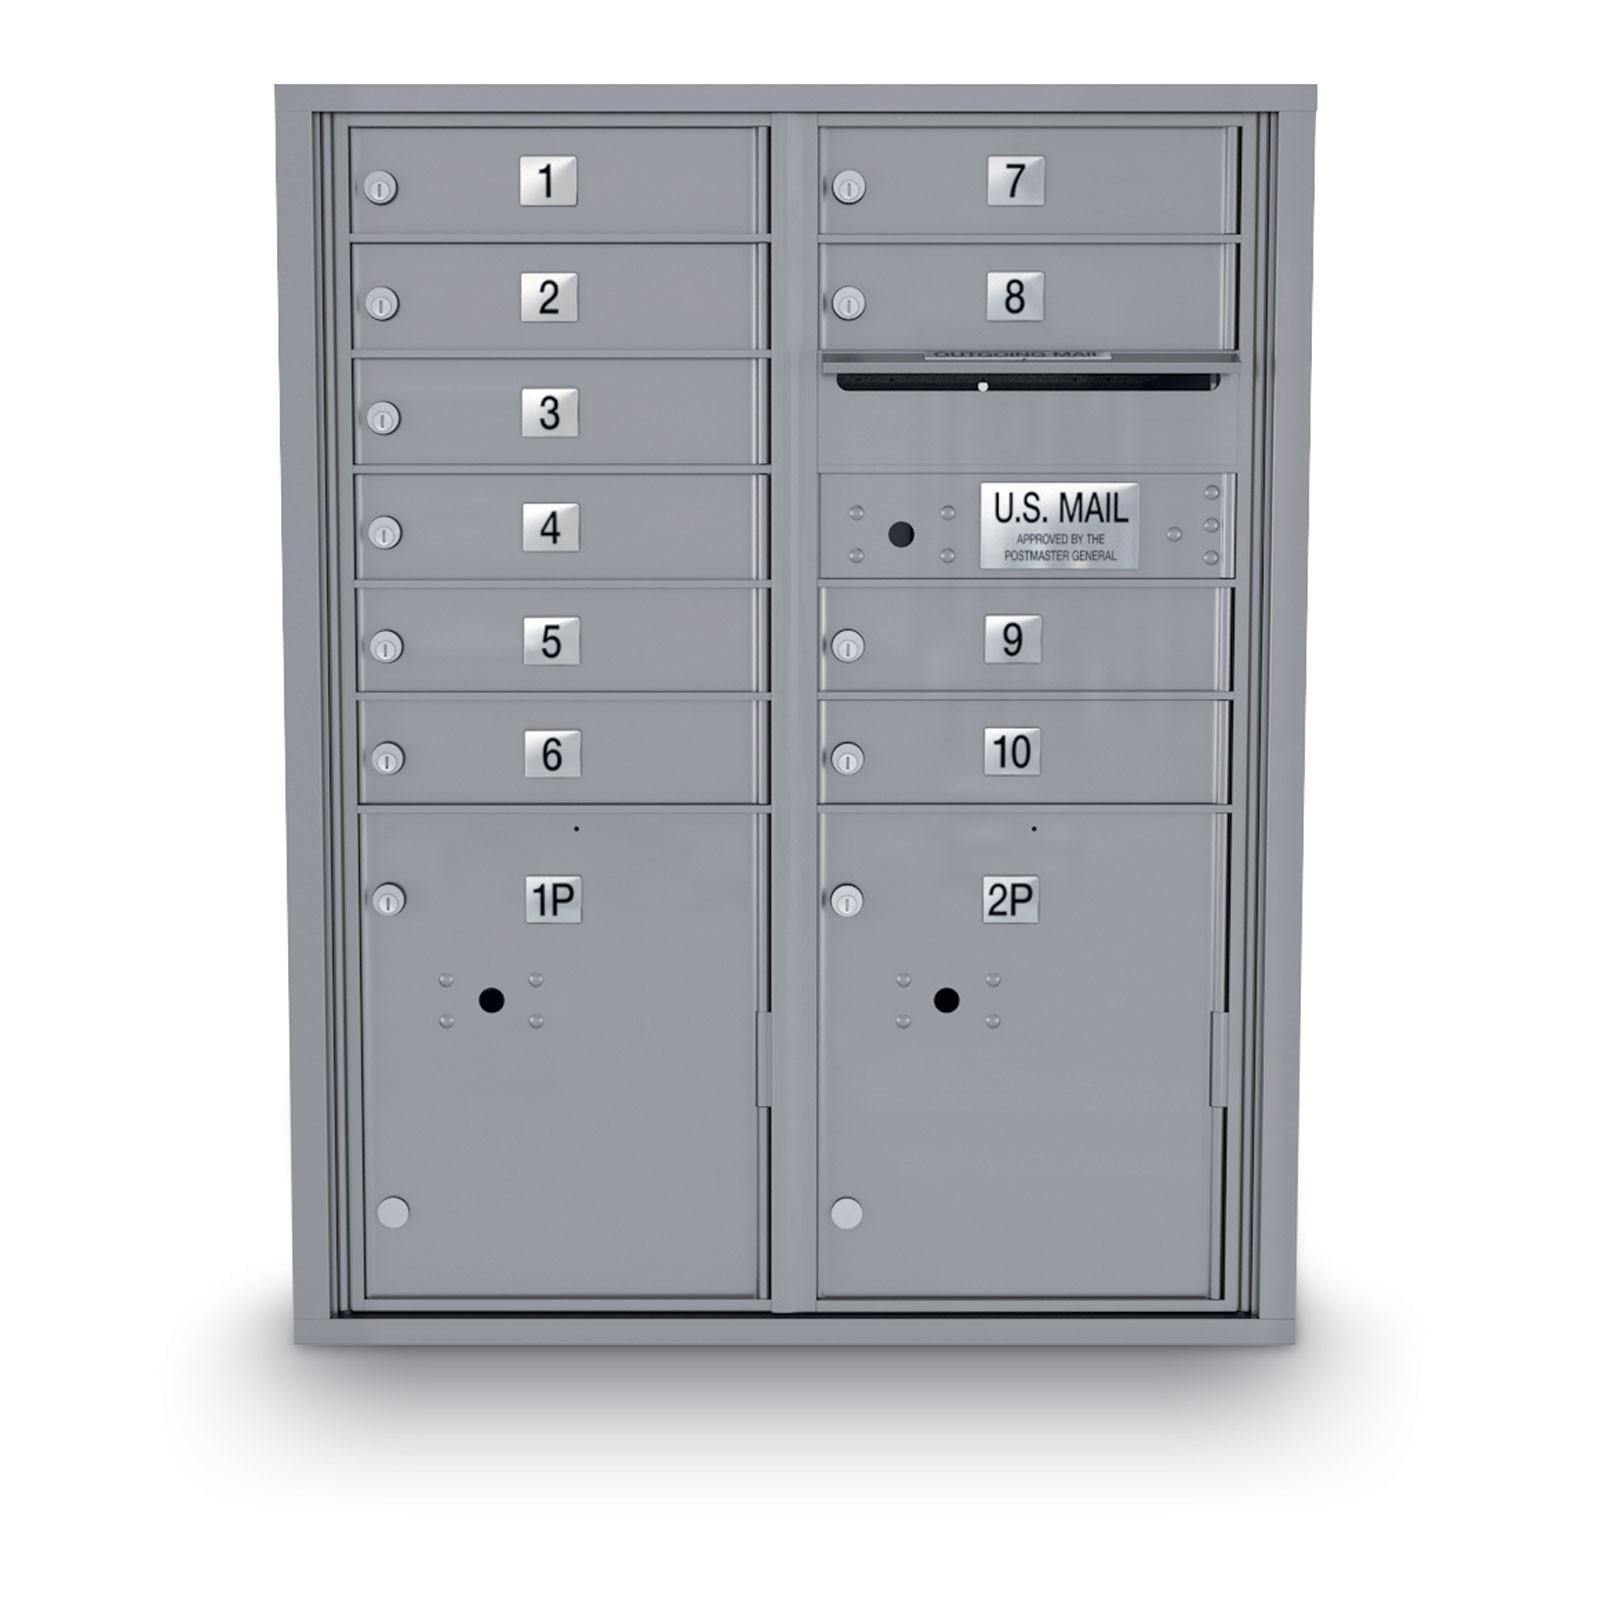 10 Door 4C Horiztonal Mailbox - 2 Parcel Locker